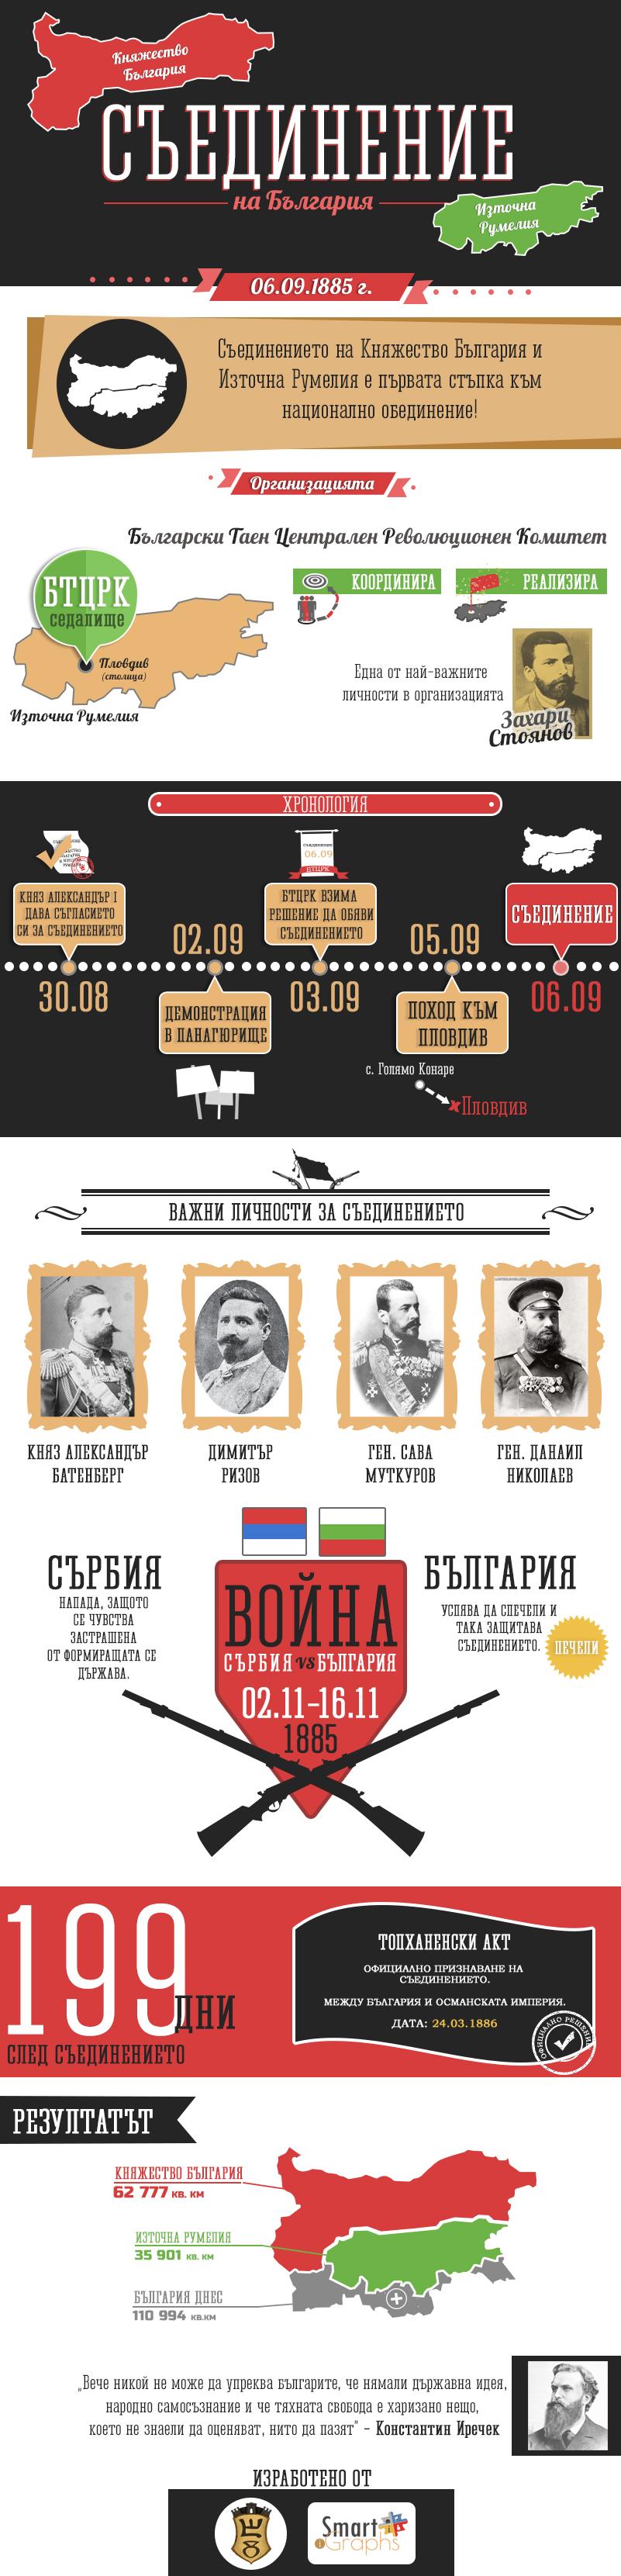 suedinenie-infographic